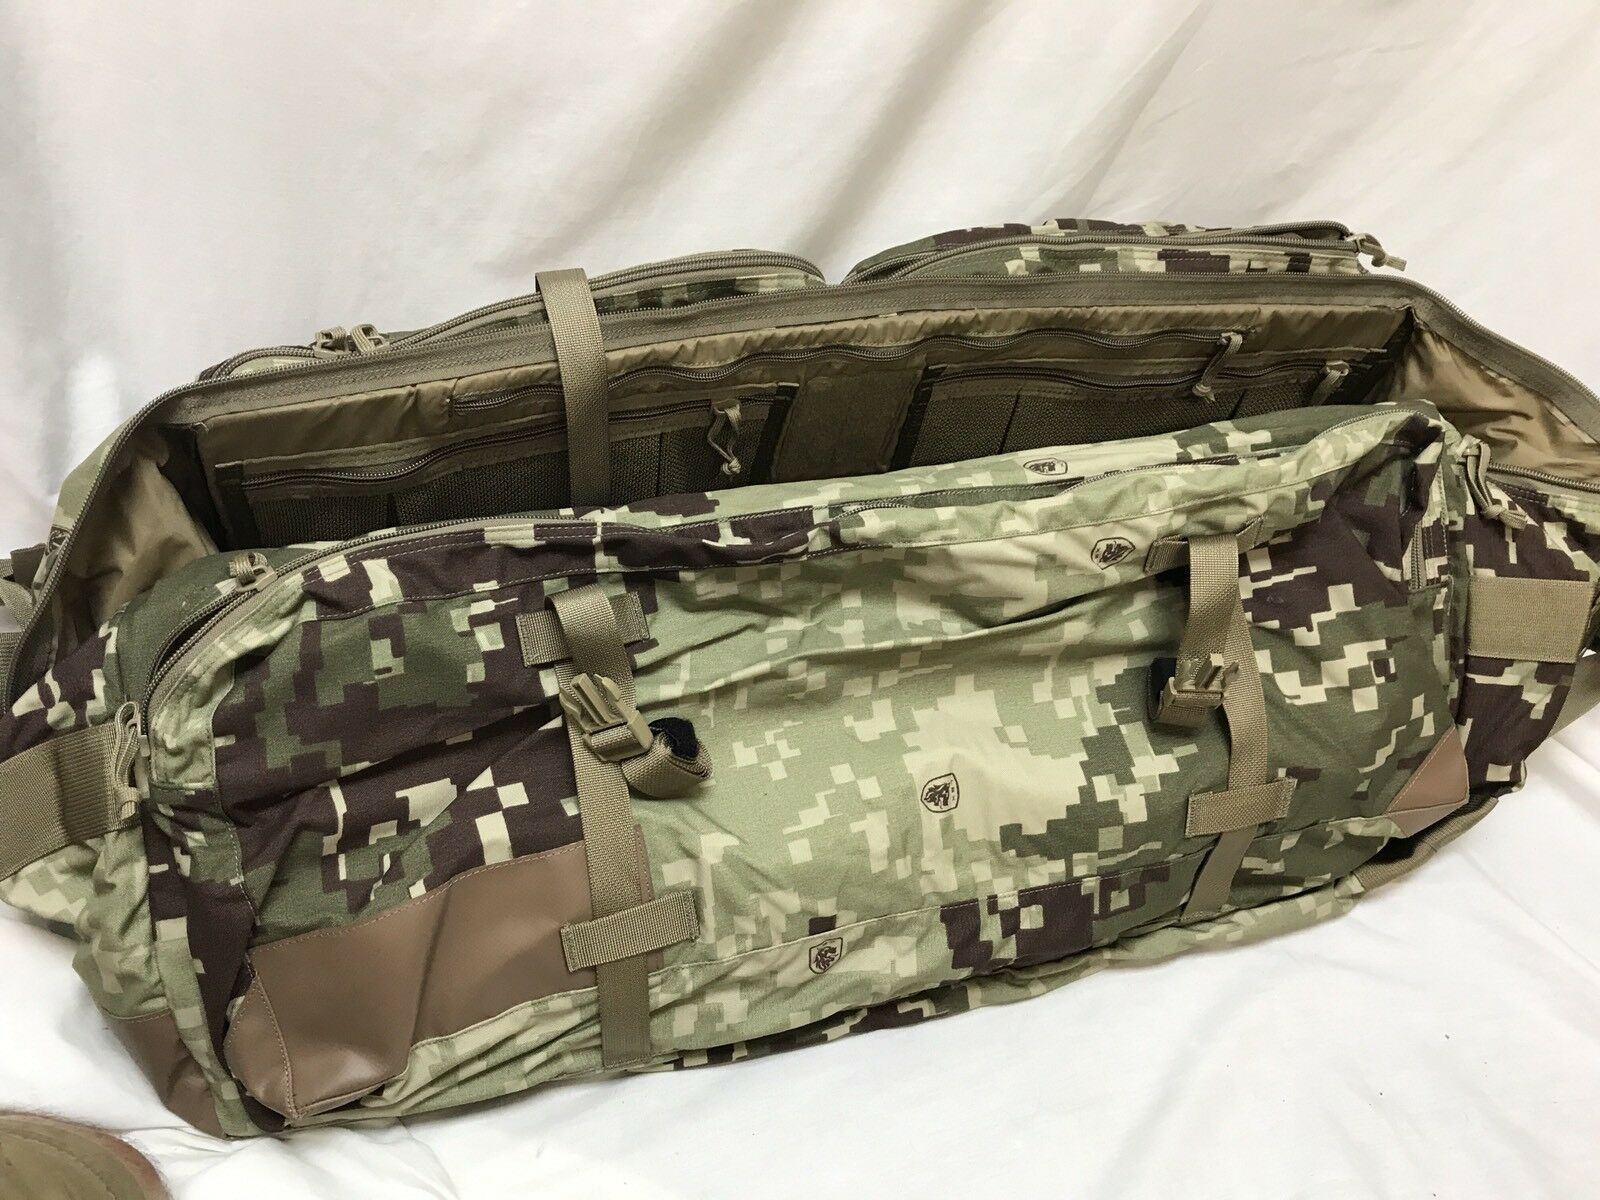 LBX Tactical Project Honor Medium Loadout Bag LBX-0316 LBT 2466A Multicam